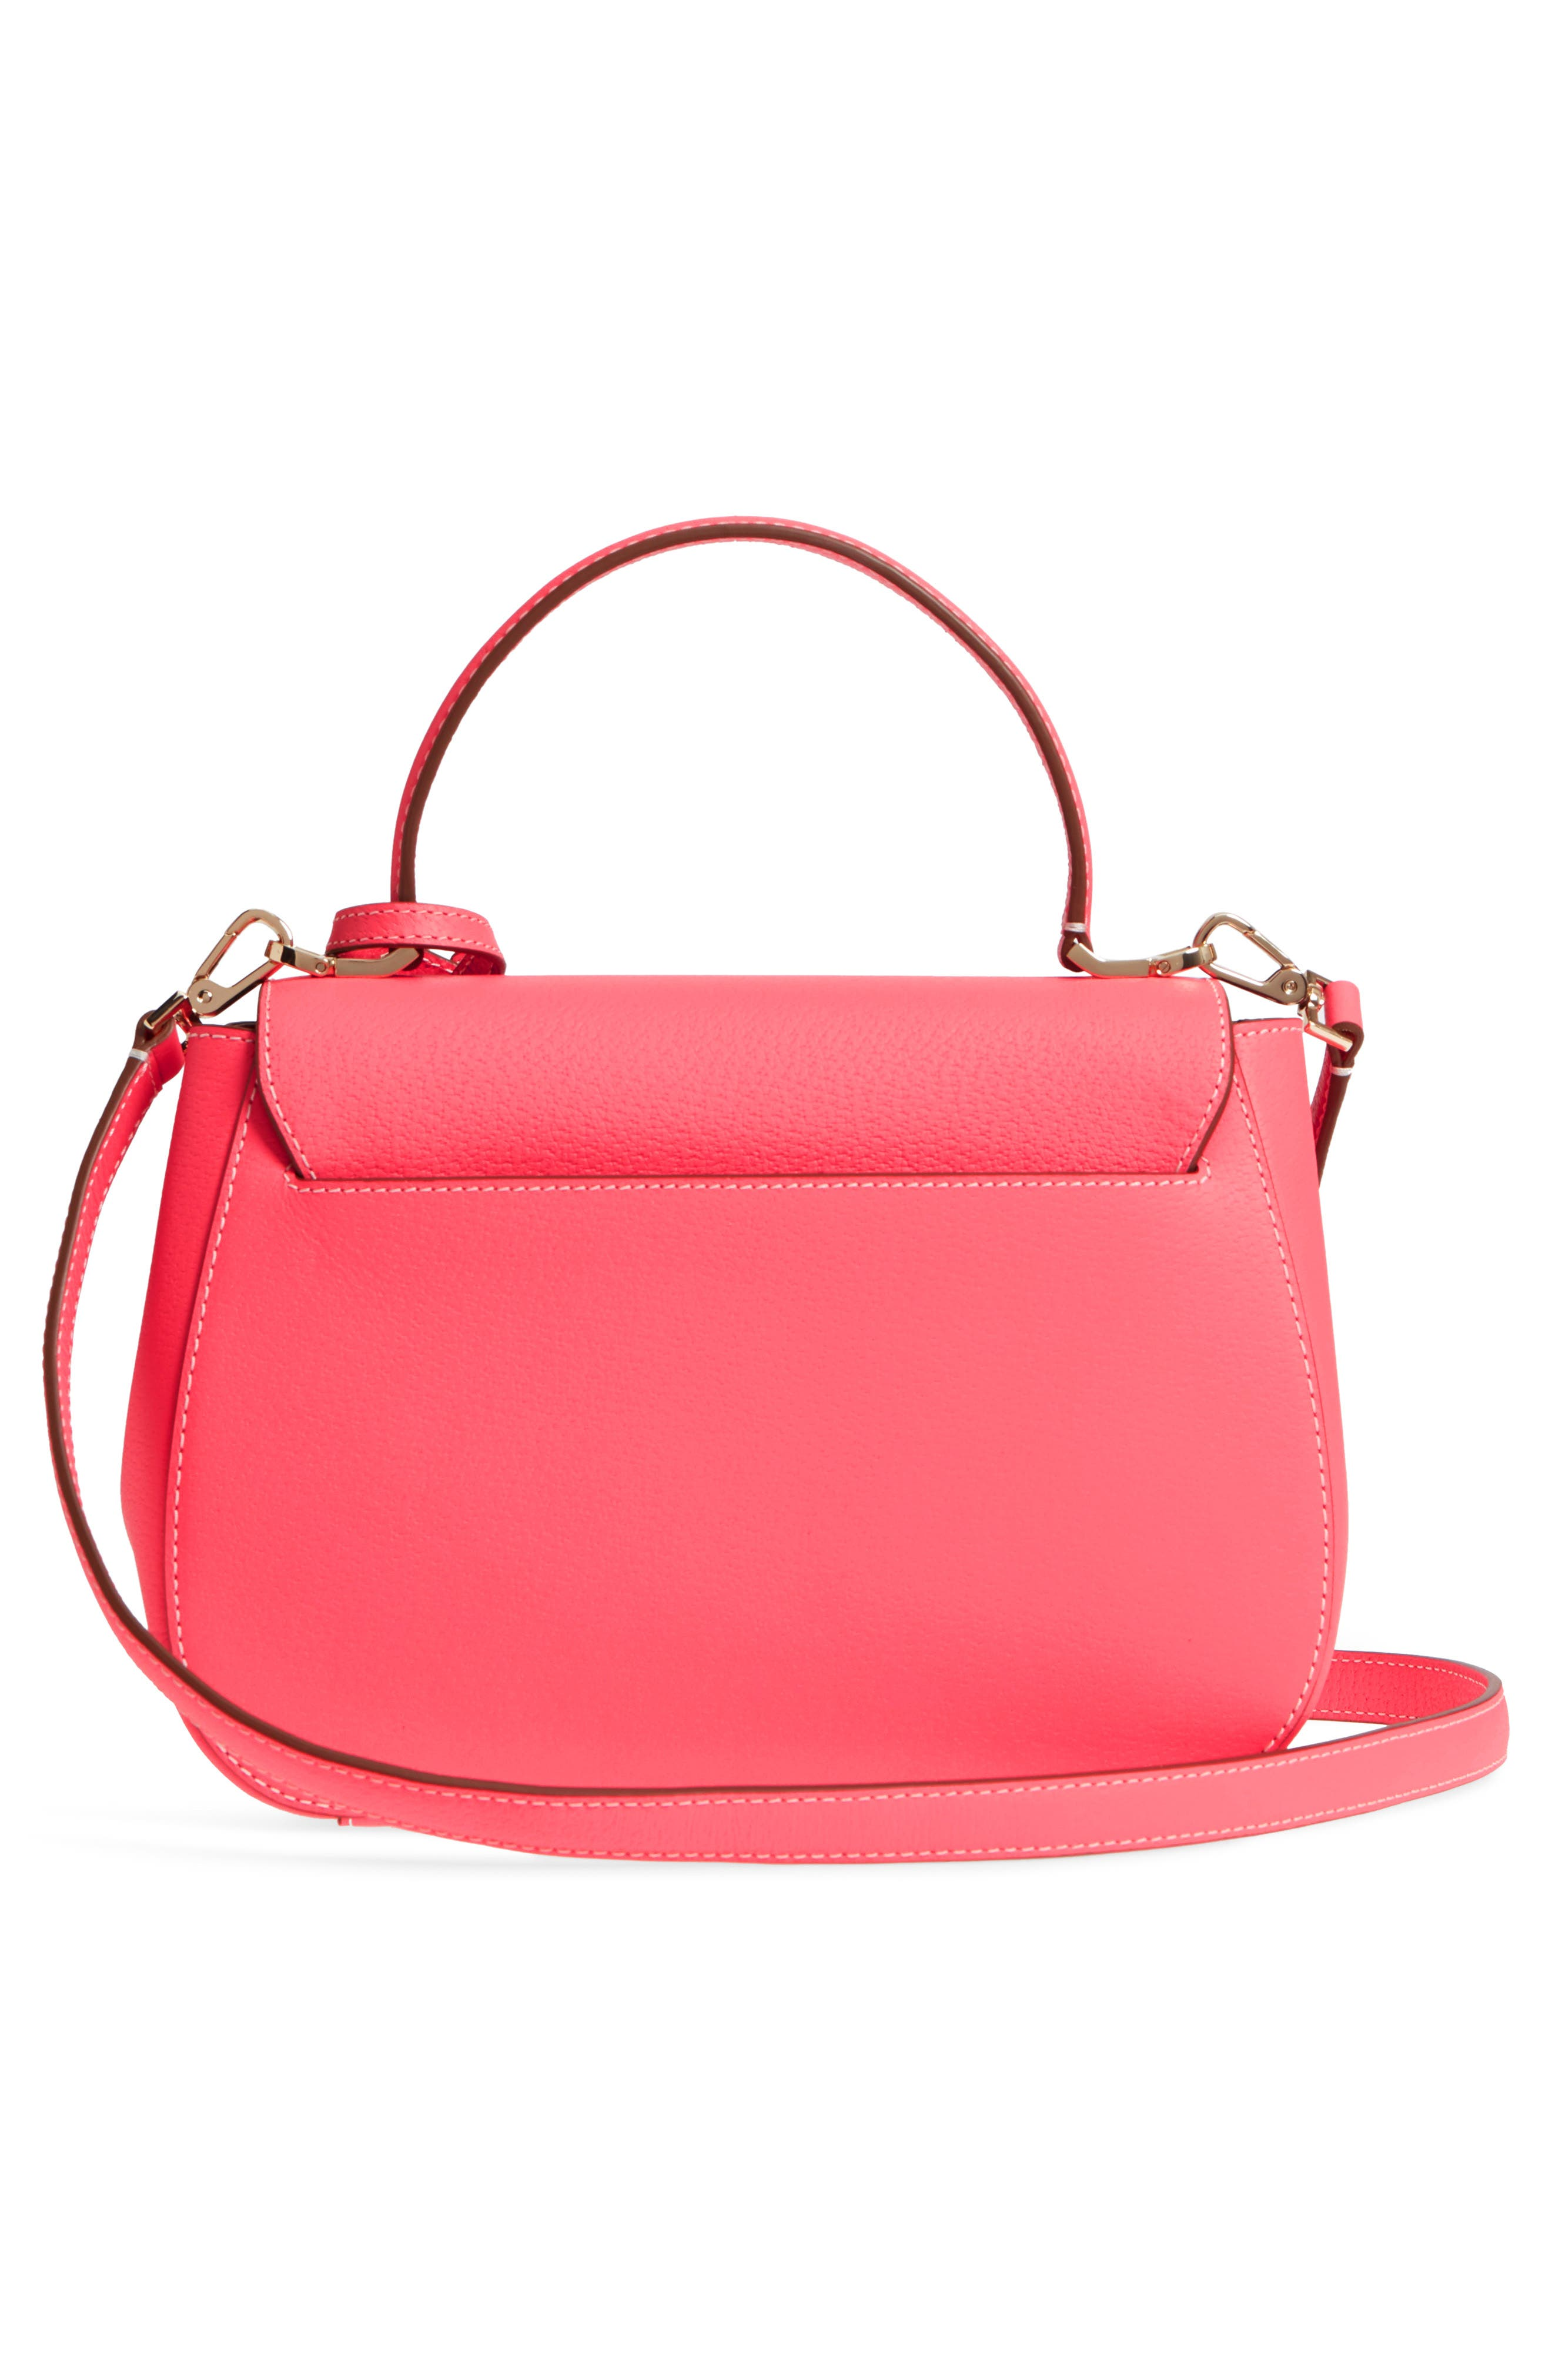 thompson street - justina leather satchel,                             Alternate thumbnail 3, color,                             650